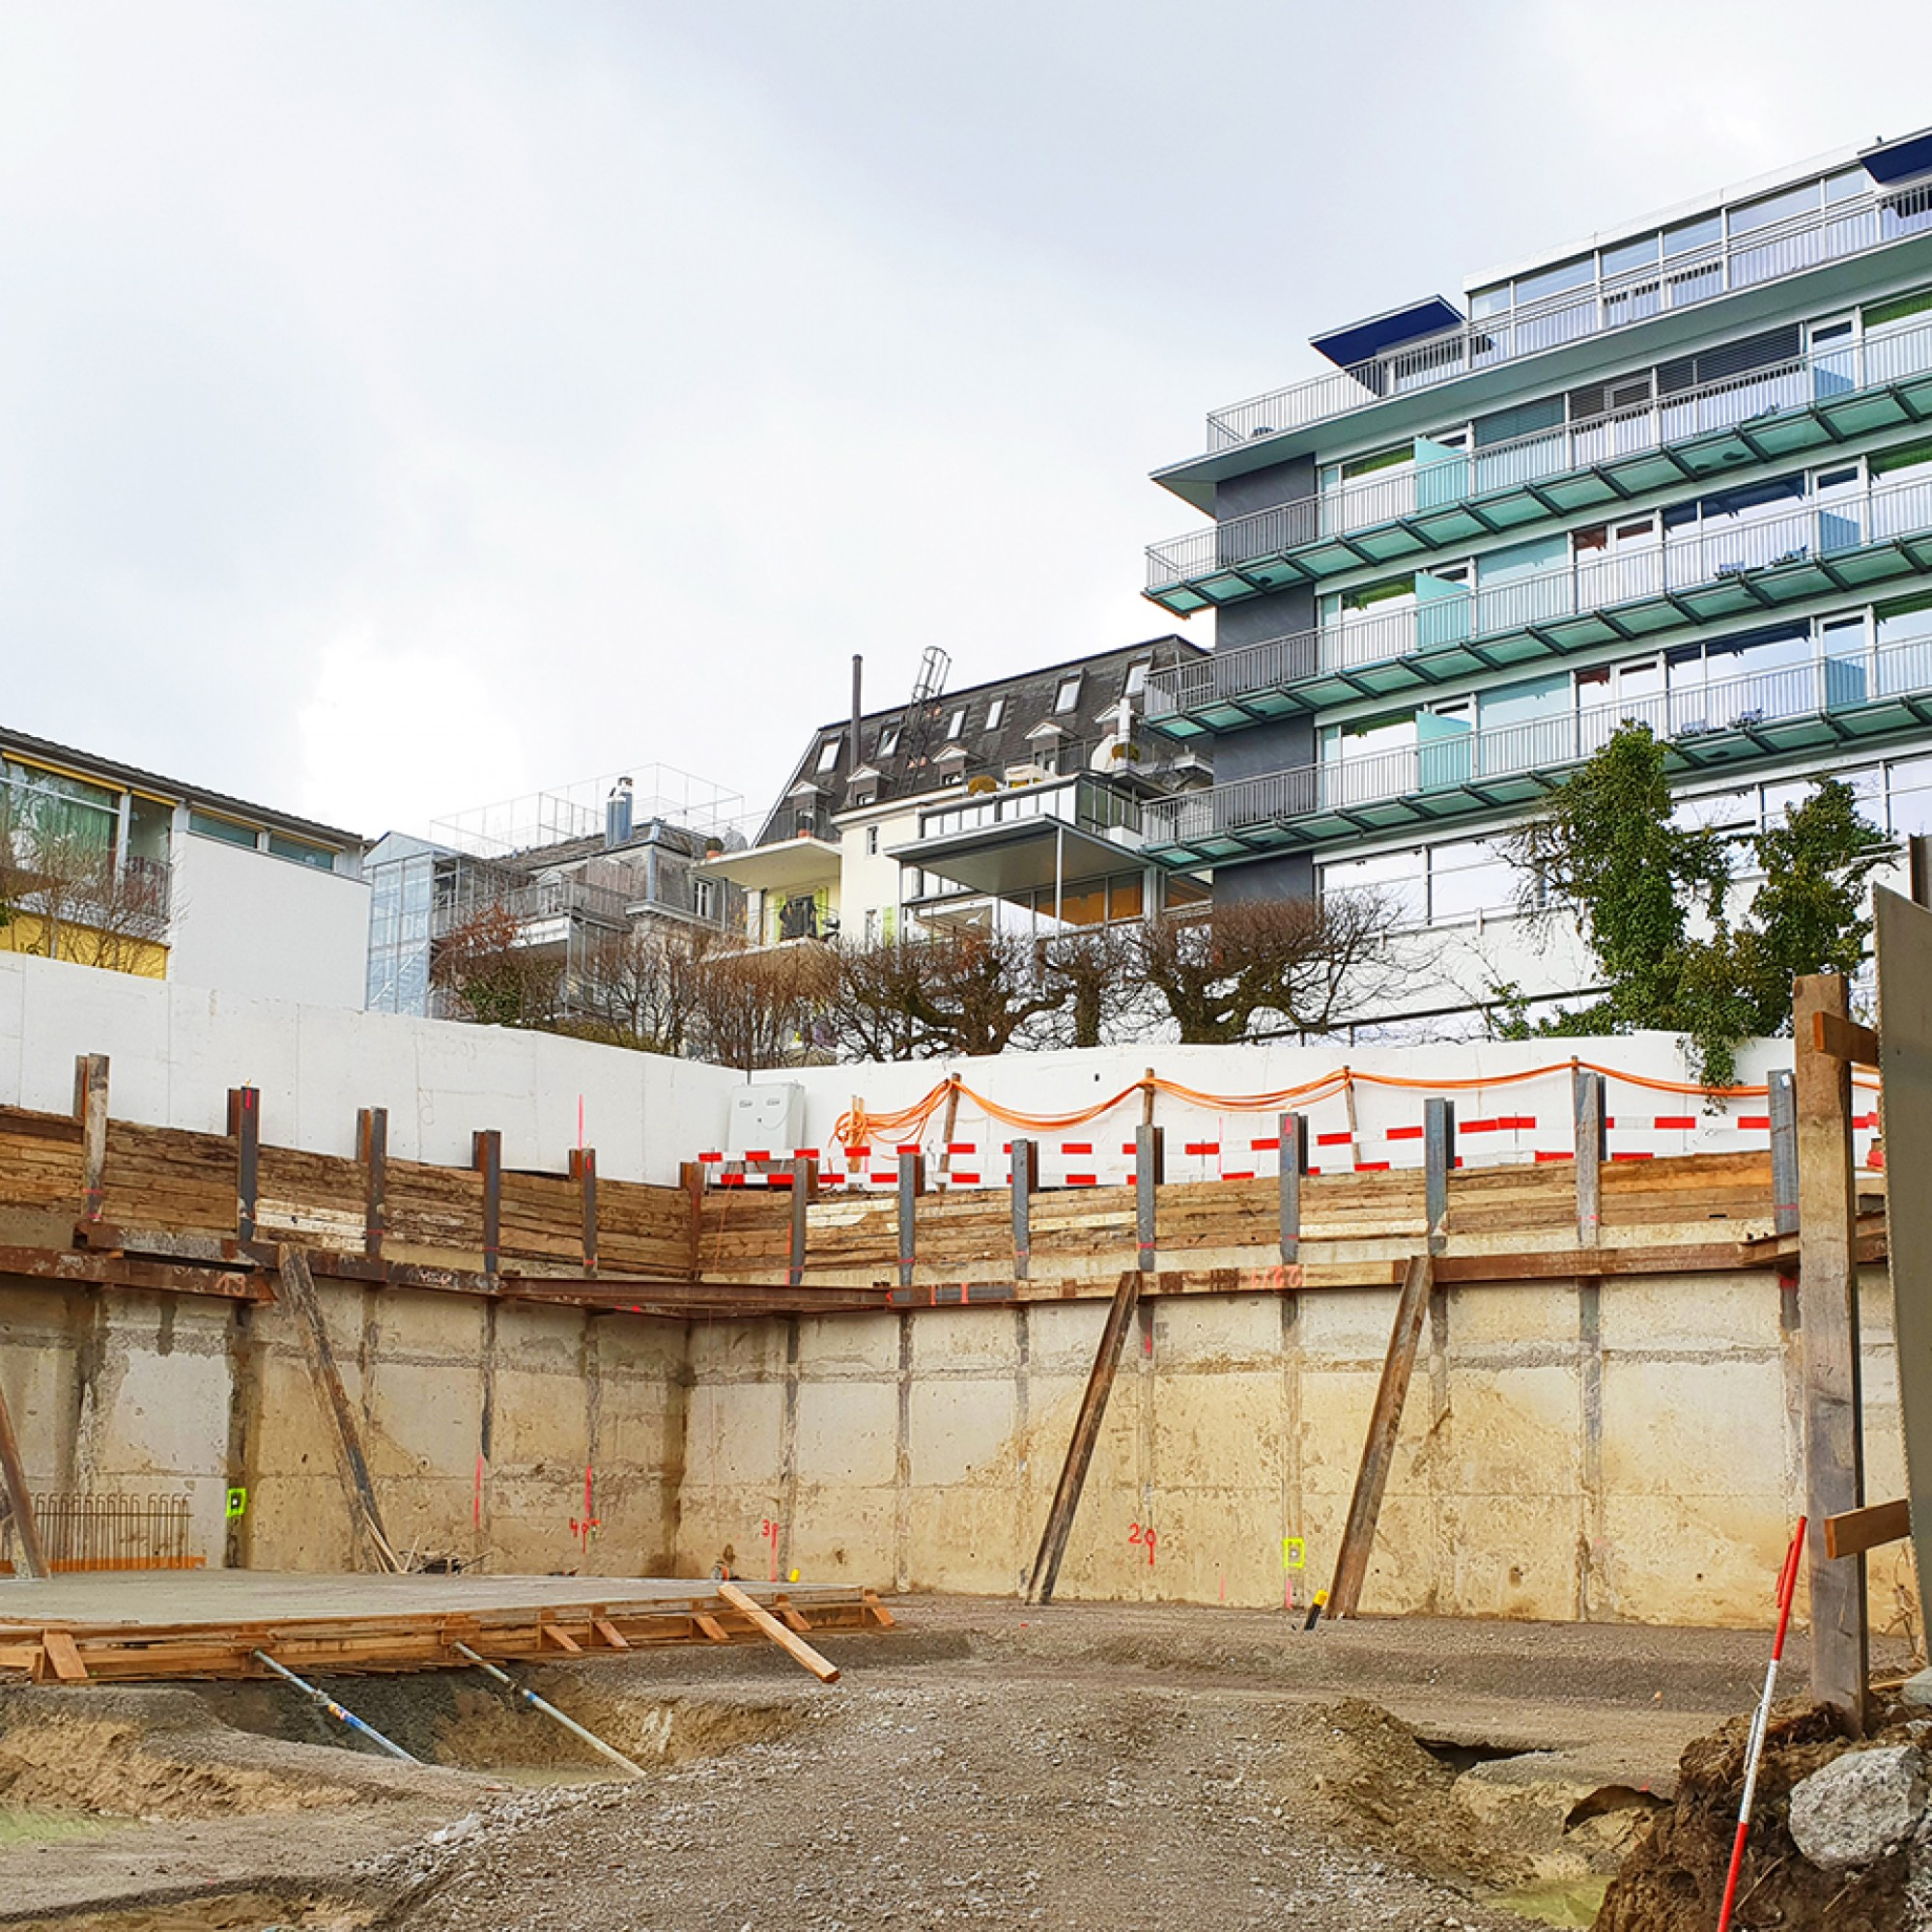 Baustelle in Thalwil, Symbolbild.